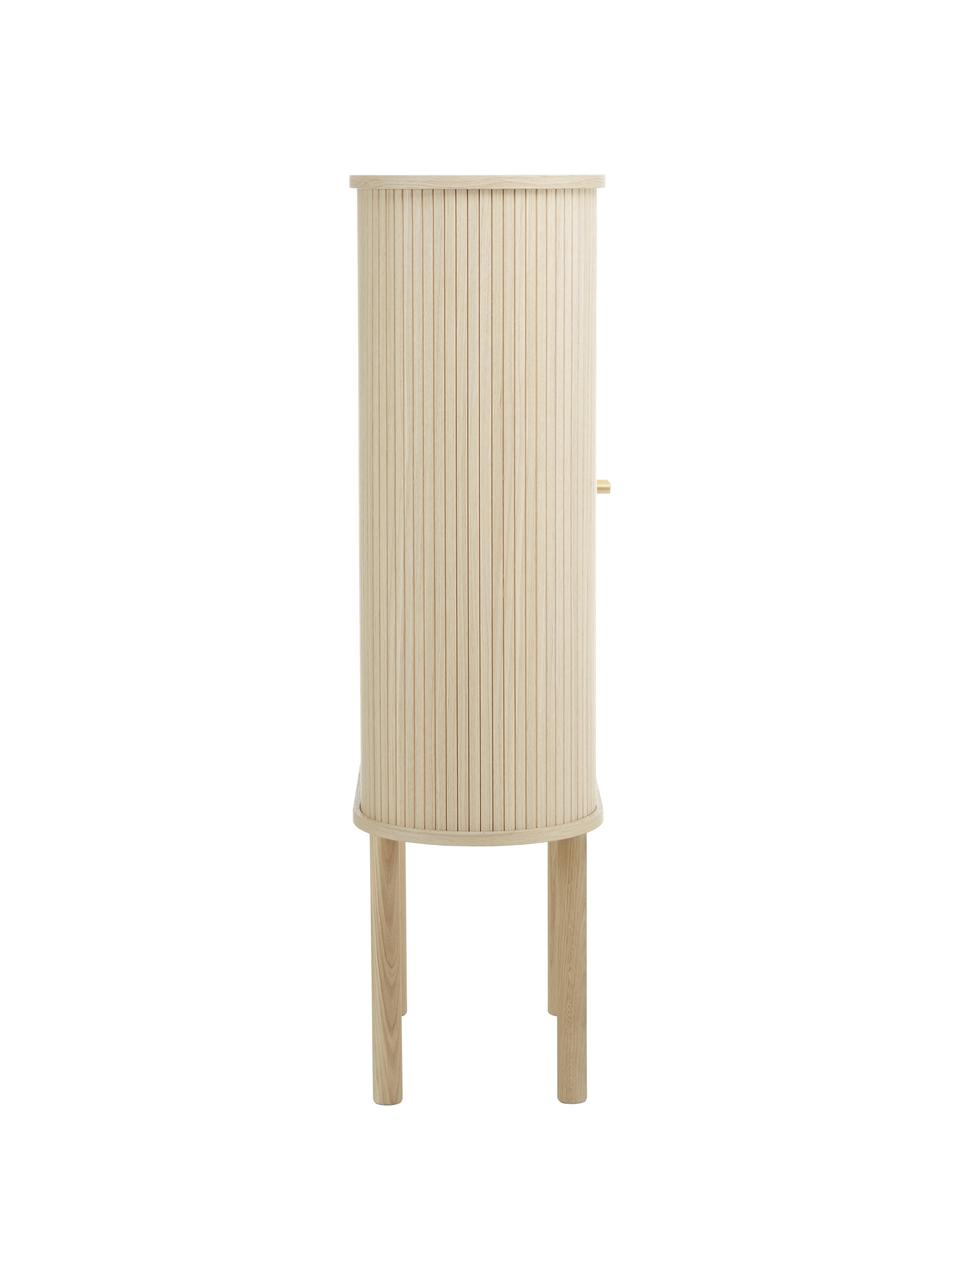 Holz-Highboard Calary mit geriffelter Front, Korpus: Mitteldichte Holzfaserpla, Beine: Massives Eichenholz, FSC-, Helles Holz, 75 x 130 cm